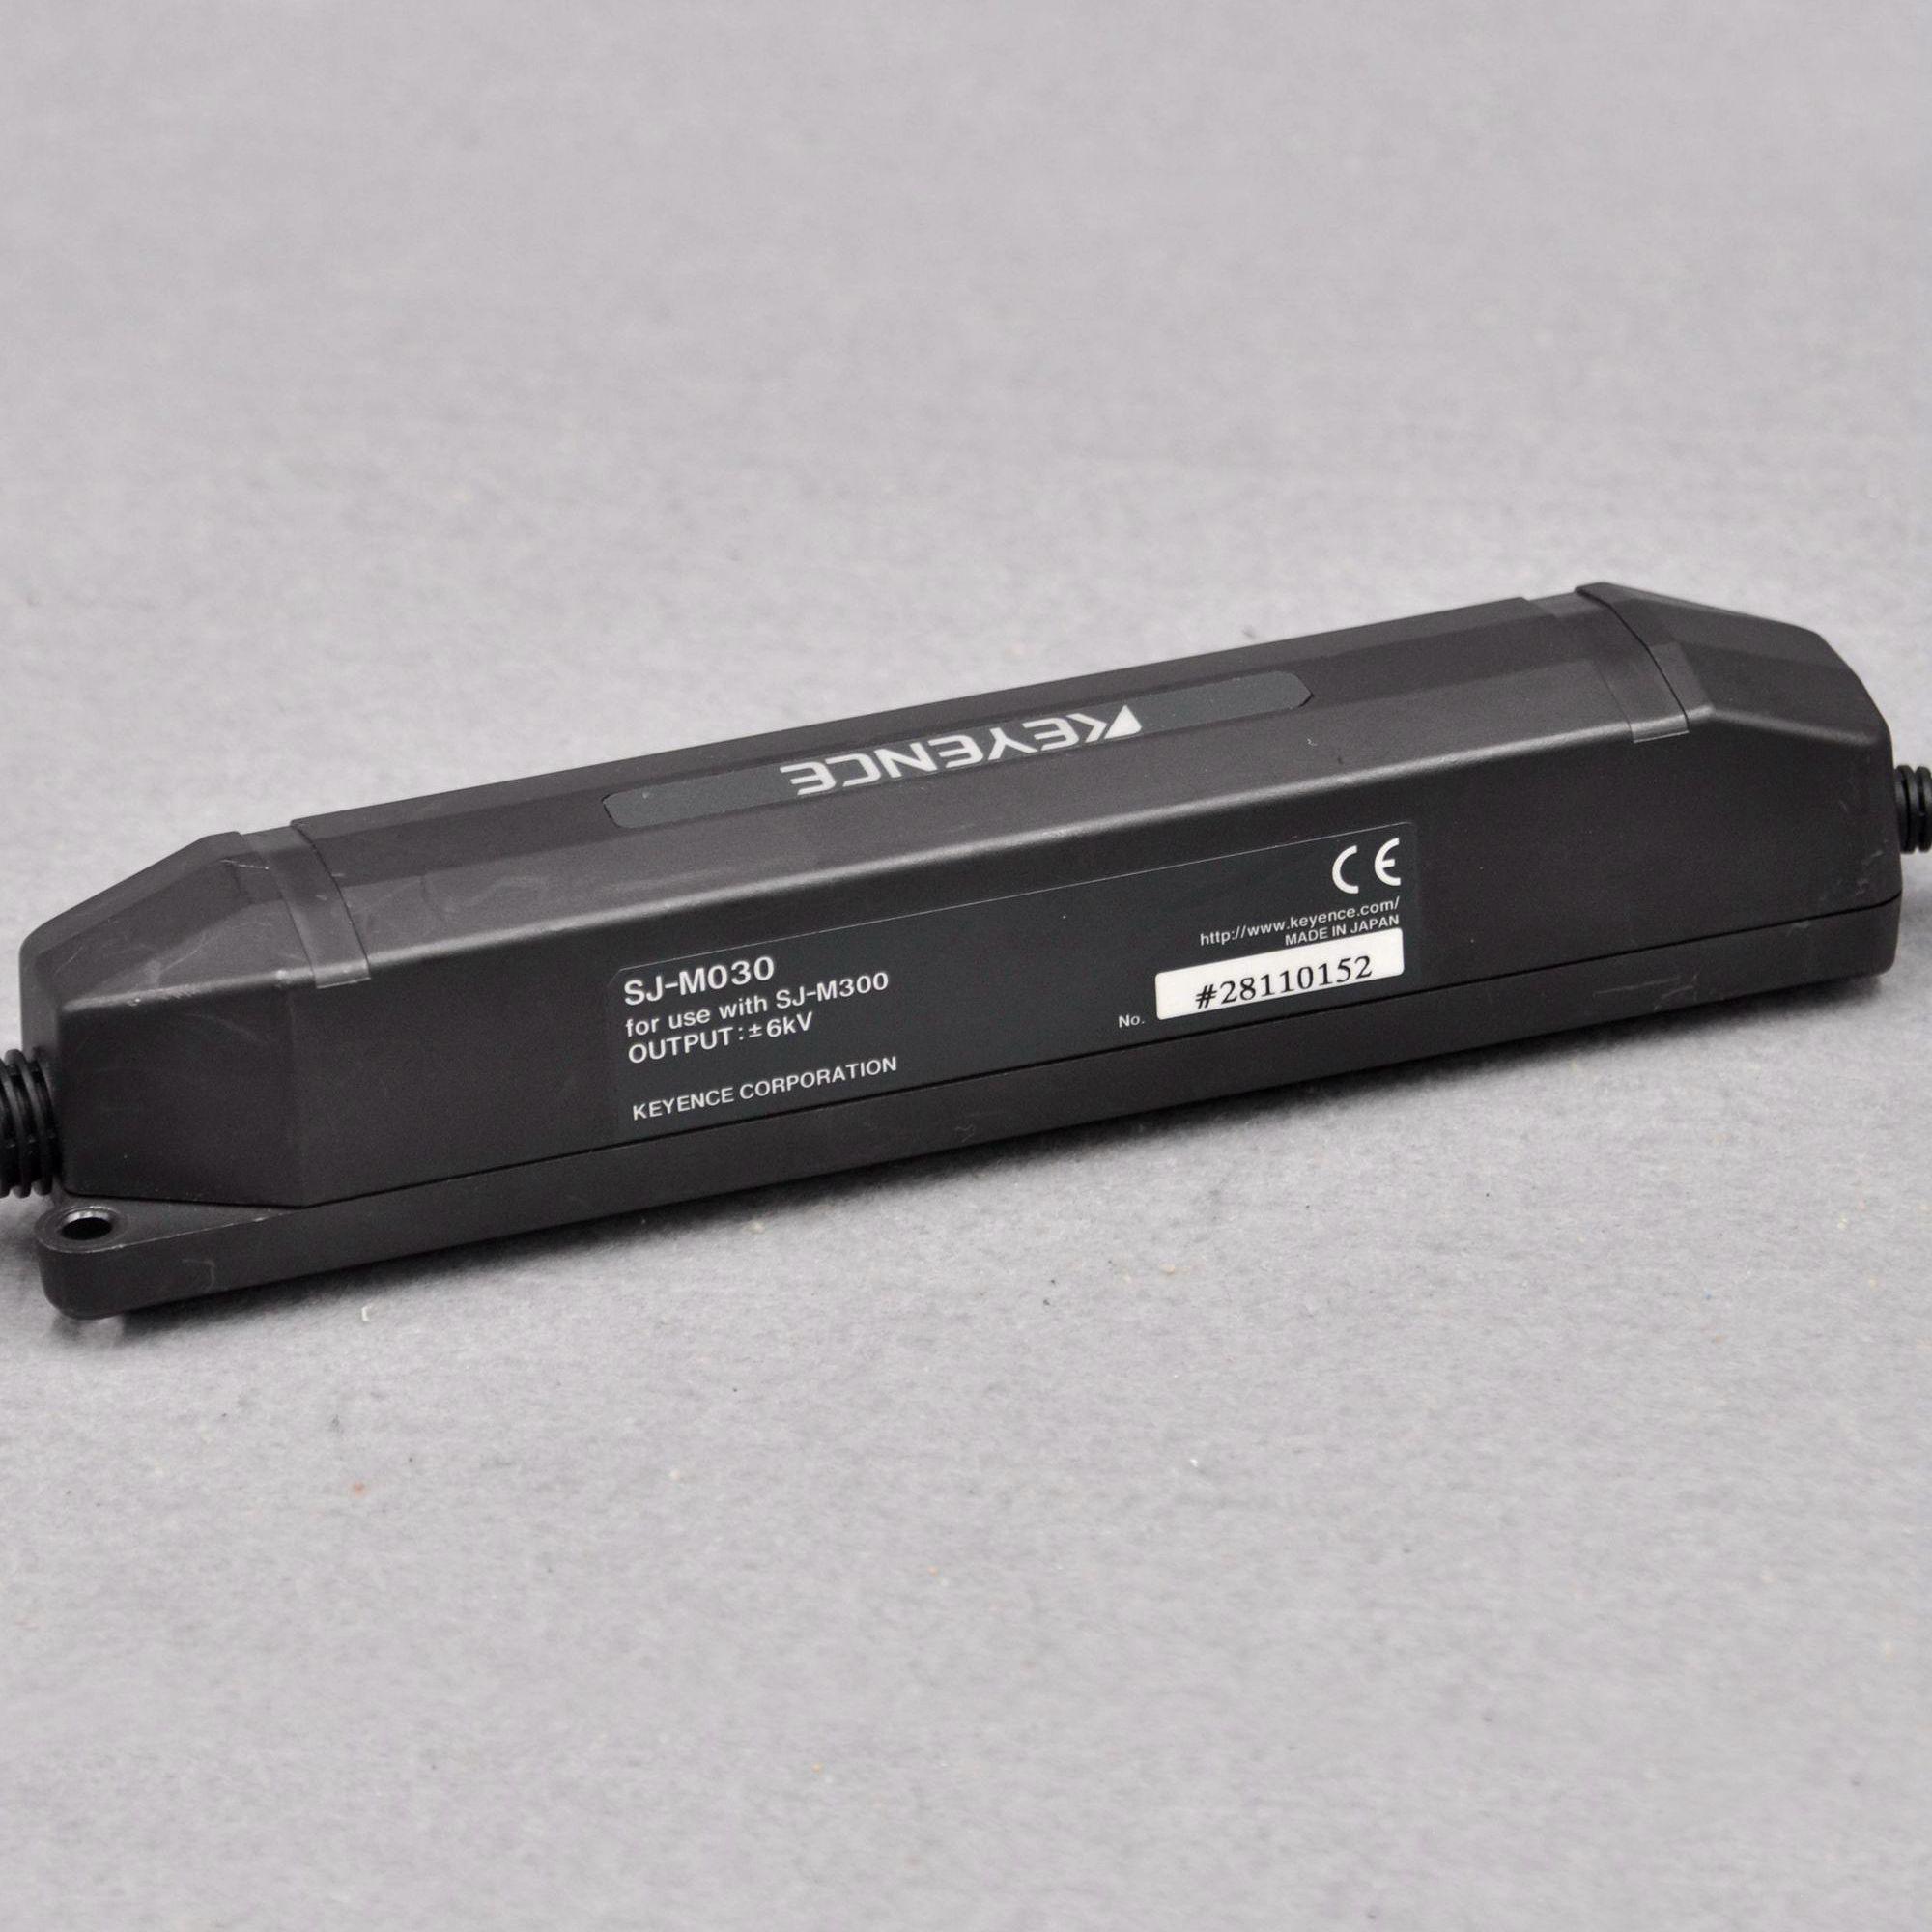 KEYENCE SJ-M030 third generation electrostatic precipitator with SJ-M300 static eliminator controller set for sale enlarge